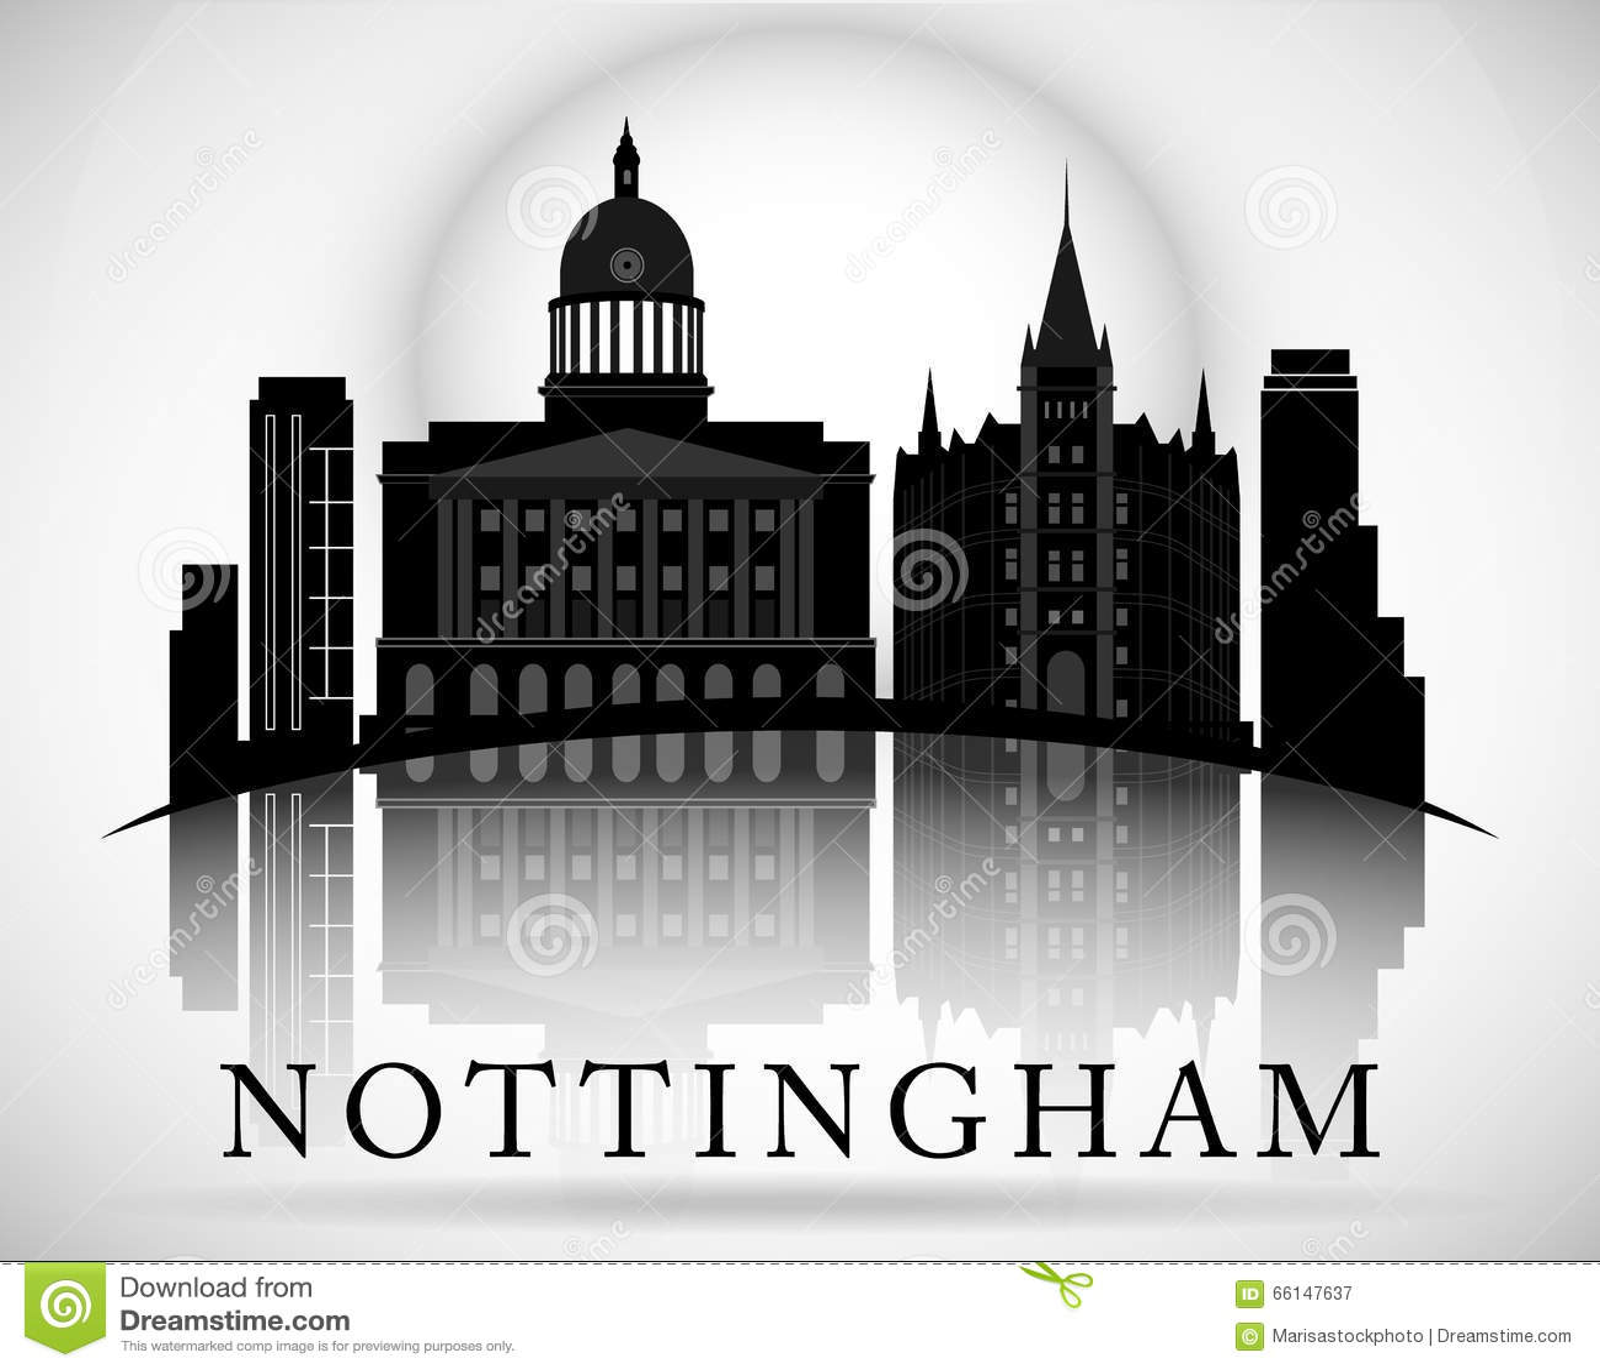 Modern Nottingham City Skyline Design. England